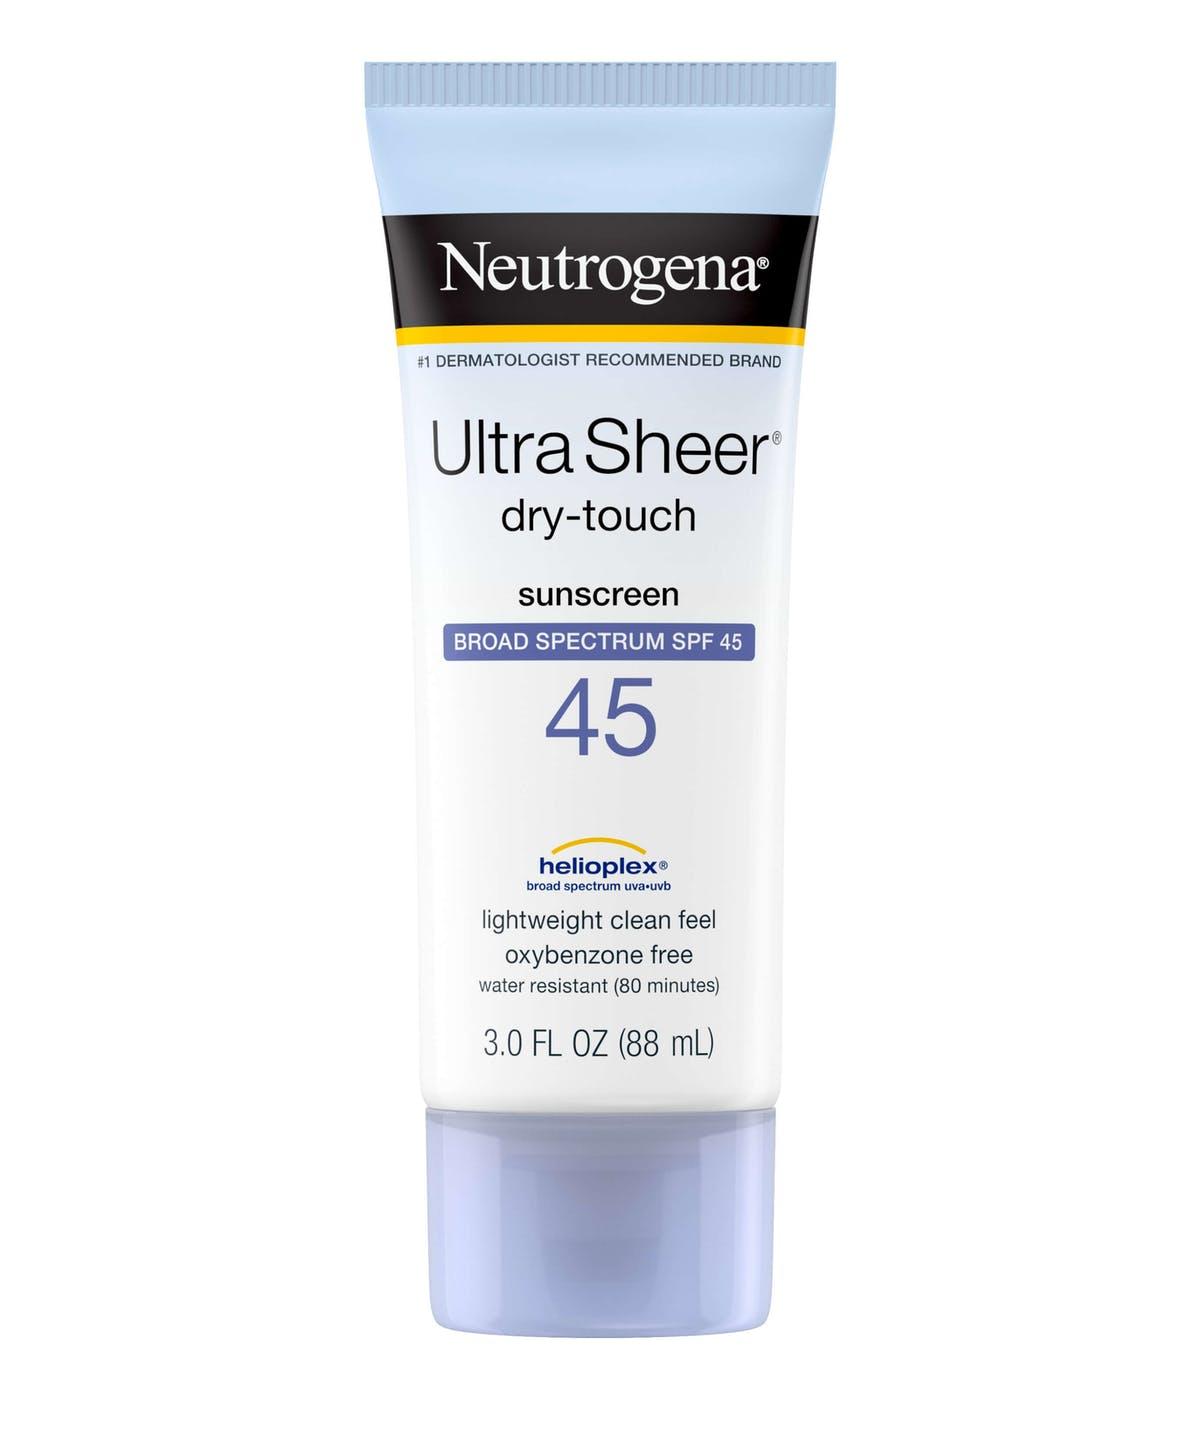 Neutrogena-Ultra-Sheer-Dry-Touch